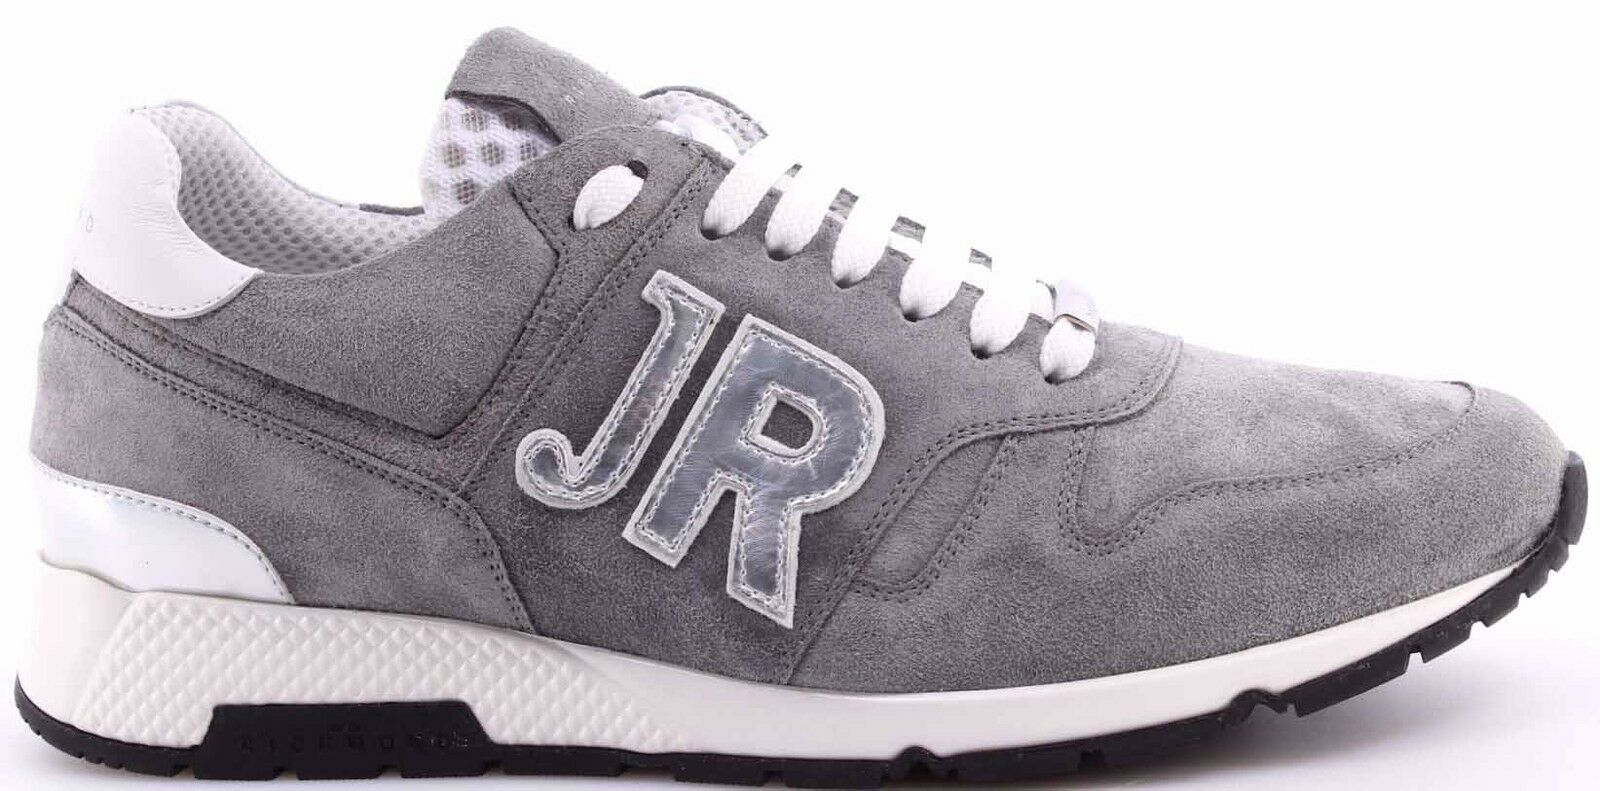 Herren Turnschuhe Schuhe JOHN RICHMOND JR 5505 Variante N Velour grau Grau Neu